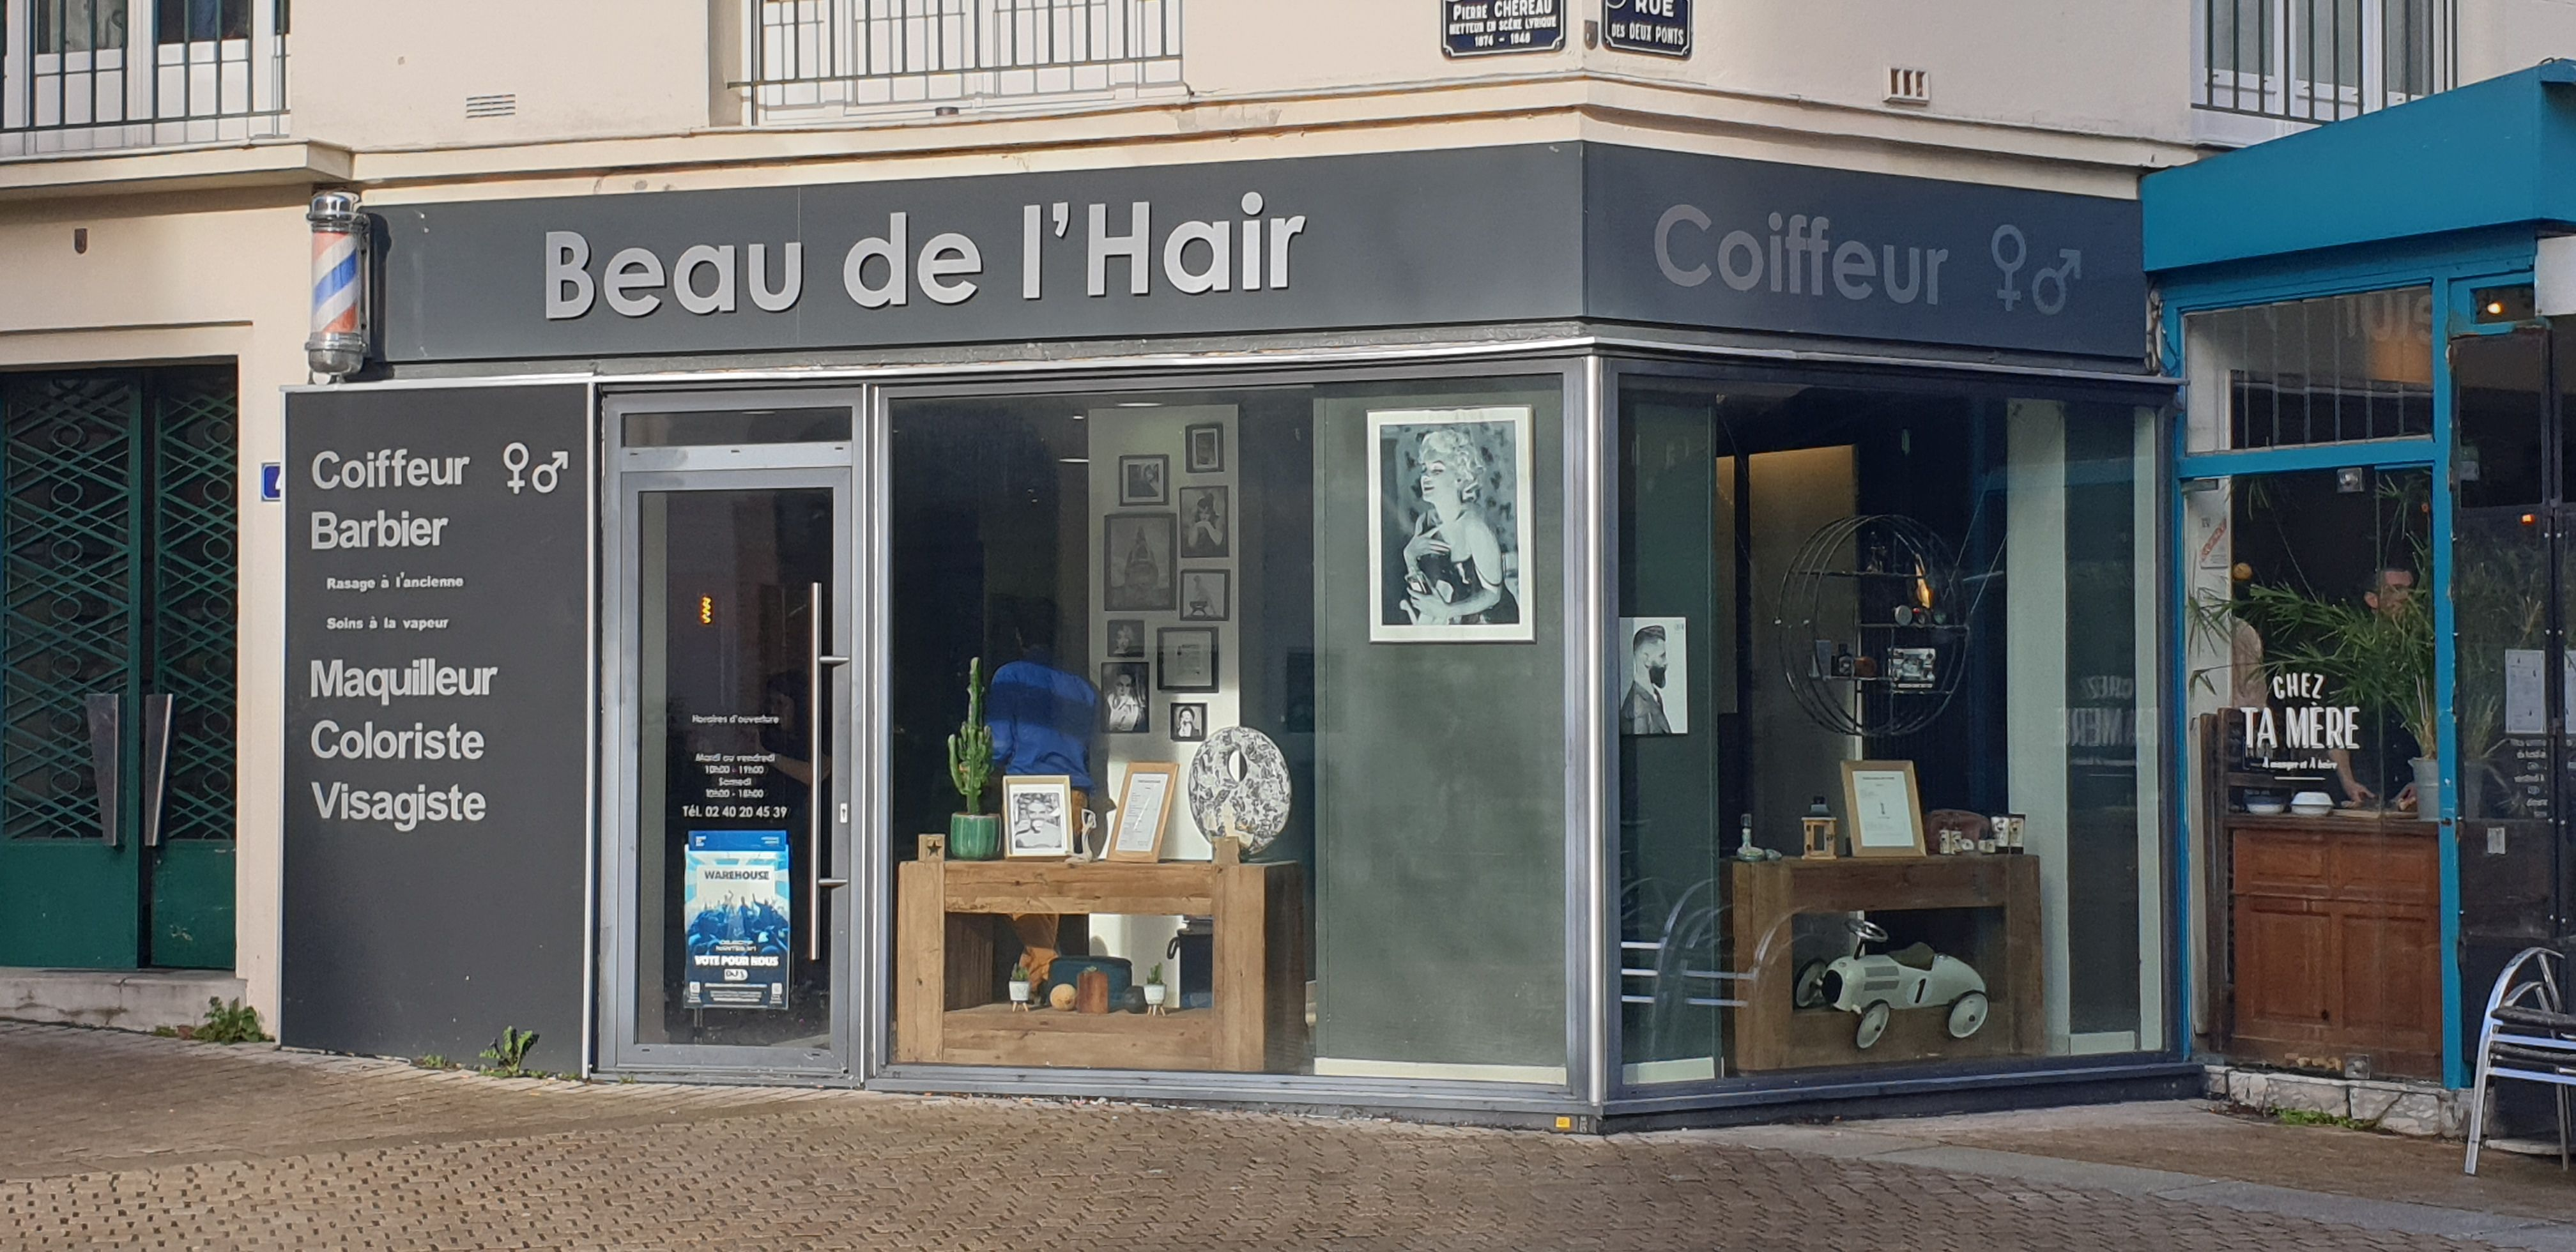 40+ Salon de coiffure nantes idees en 2021